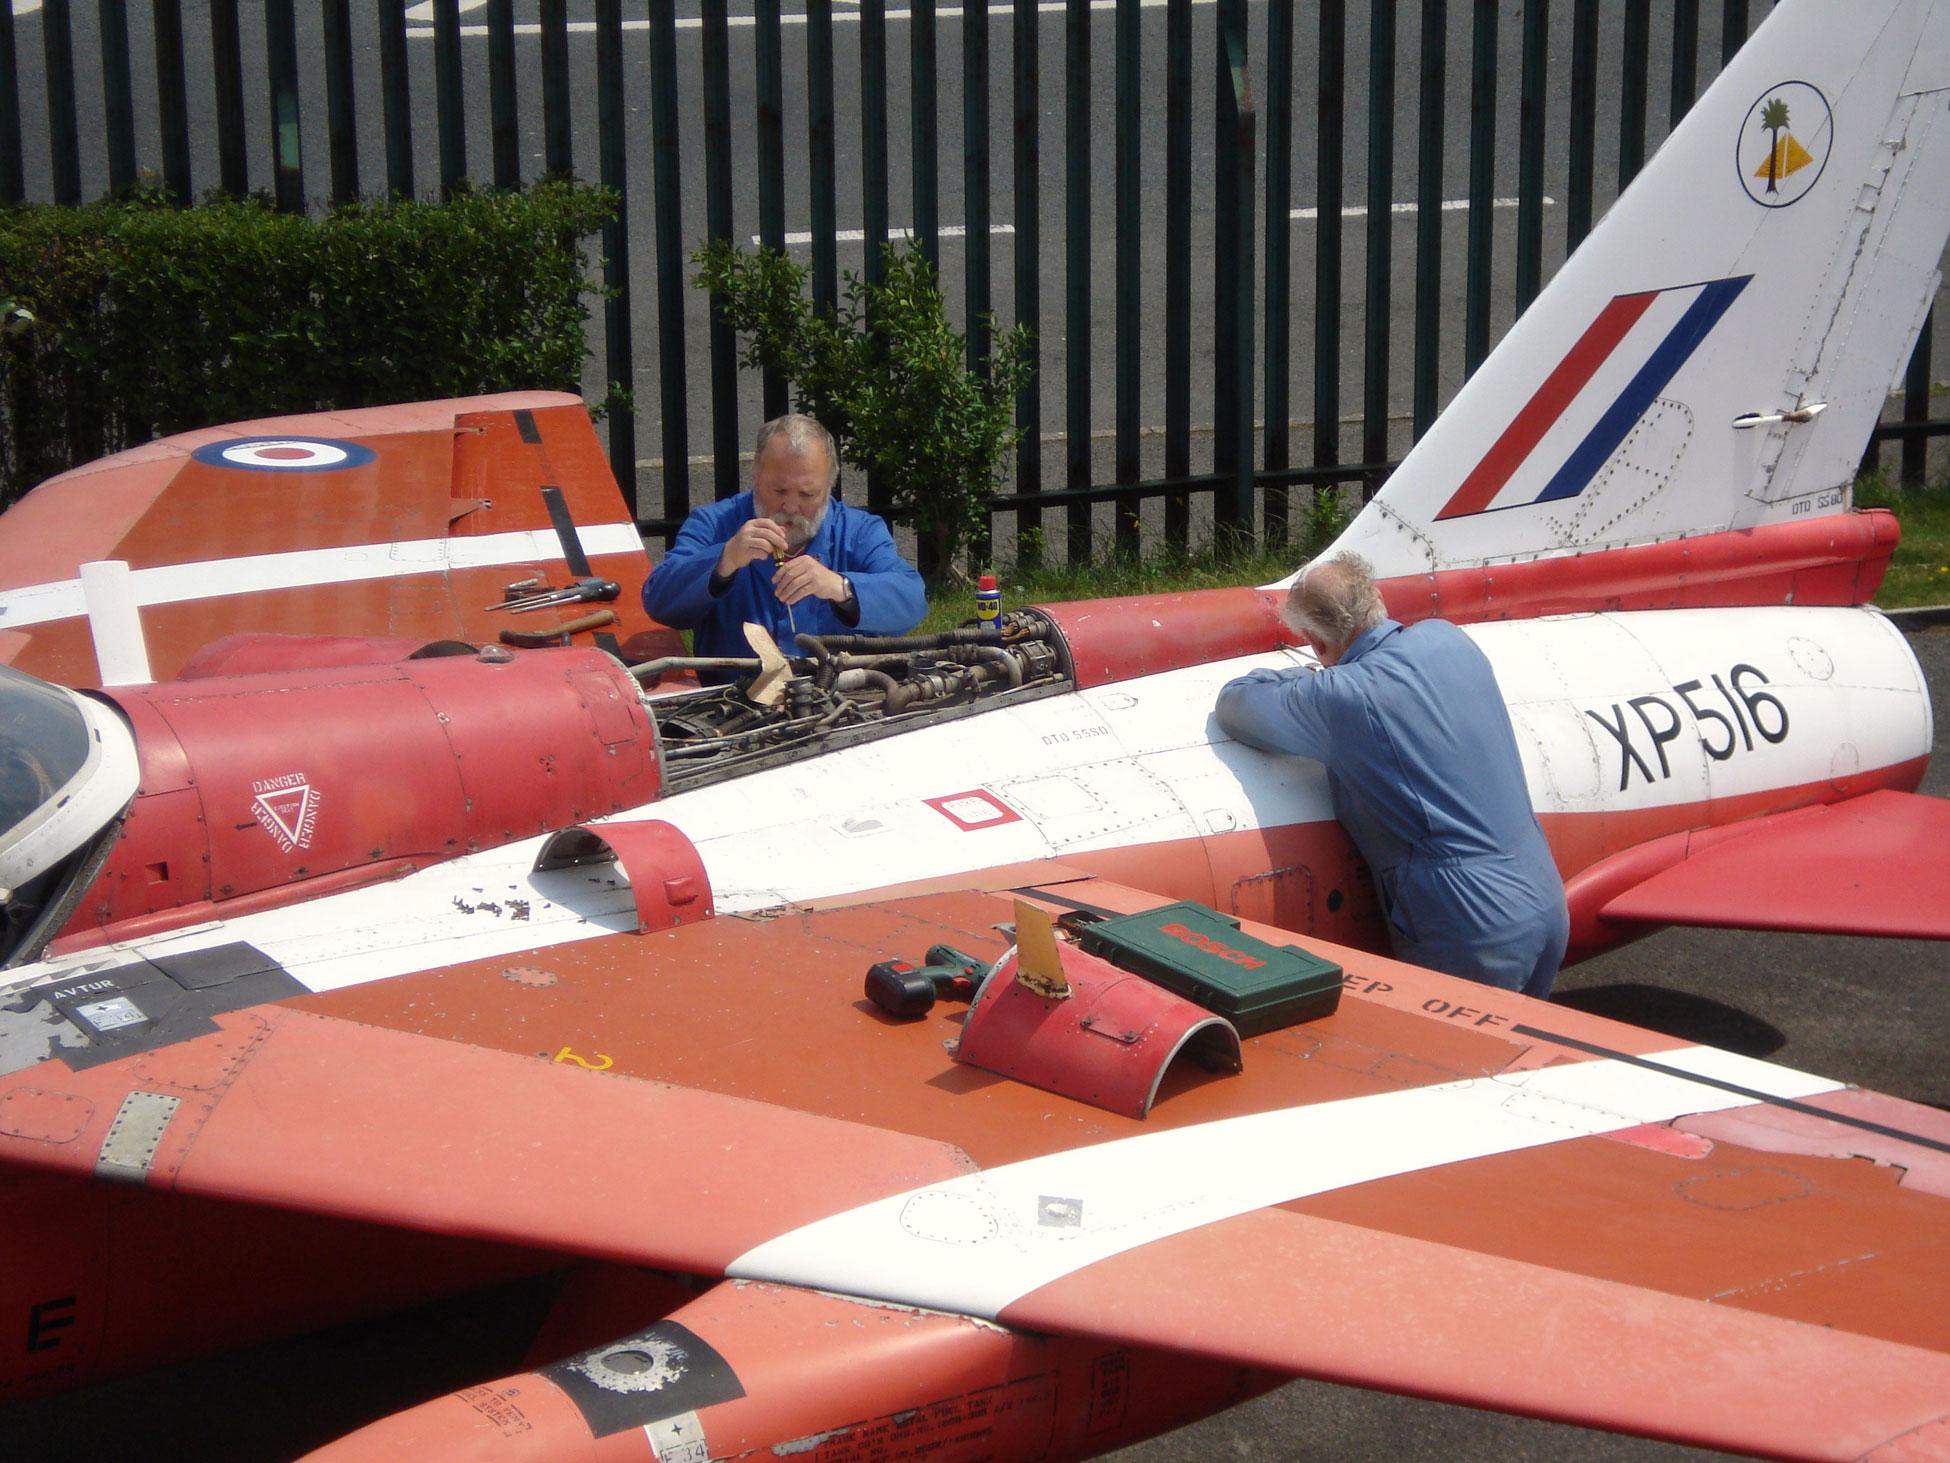 Volunteering at Farnborough Air Sciences